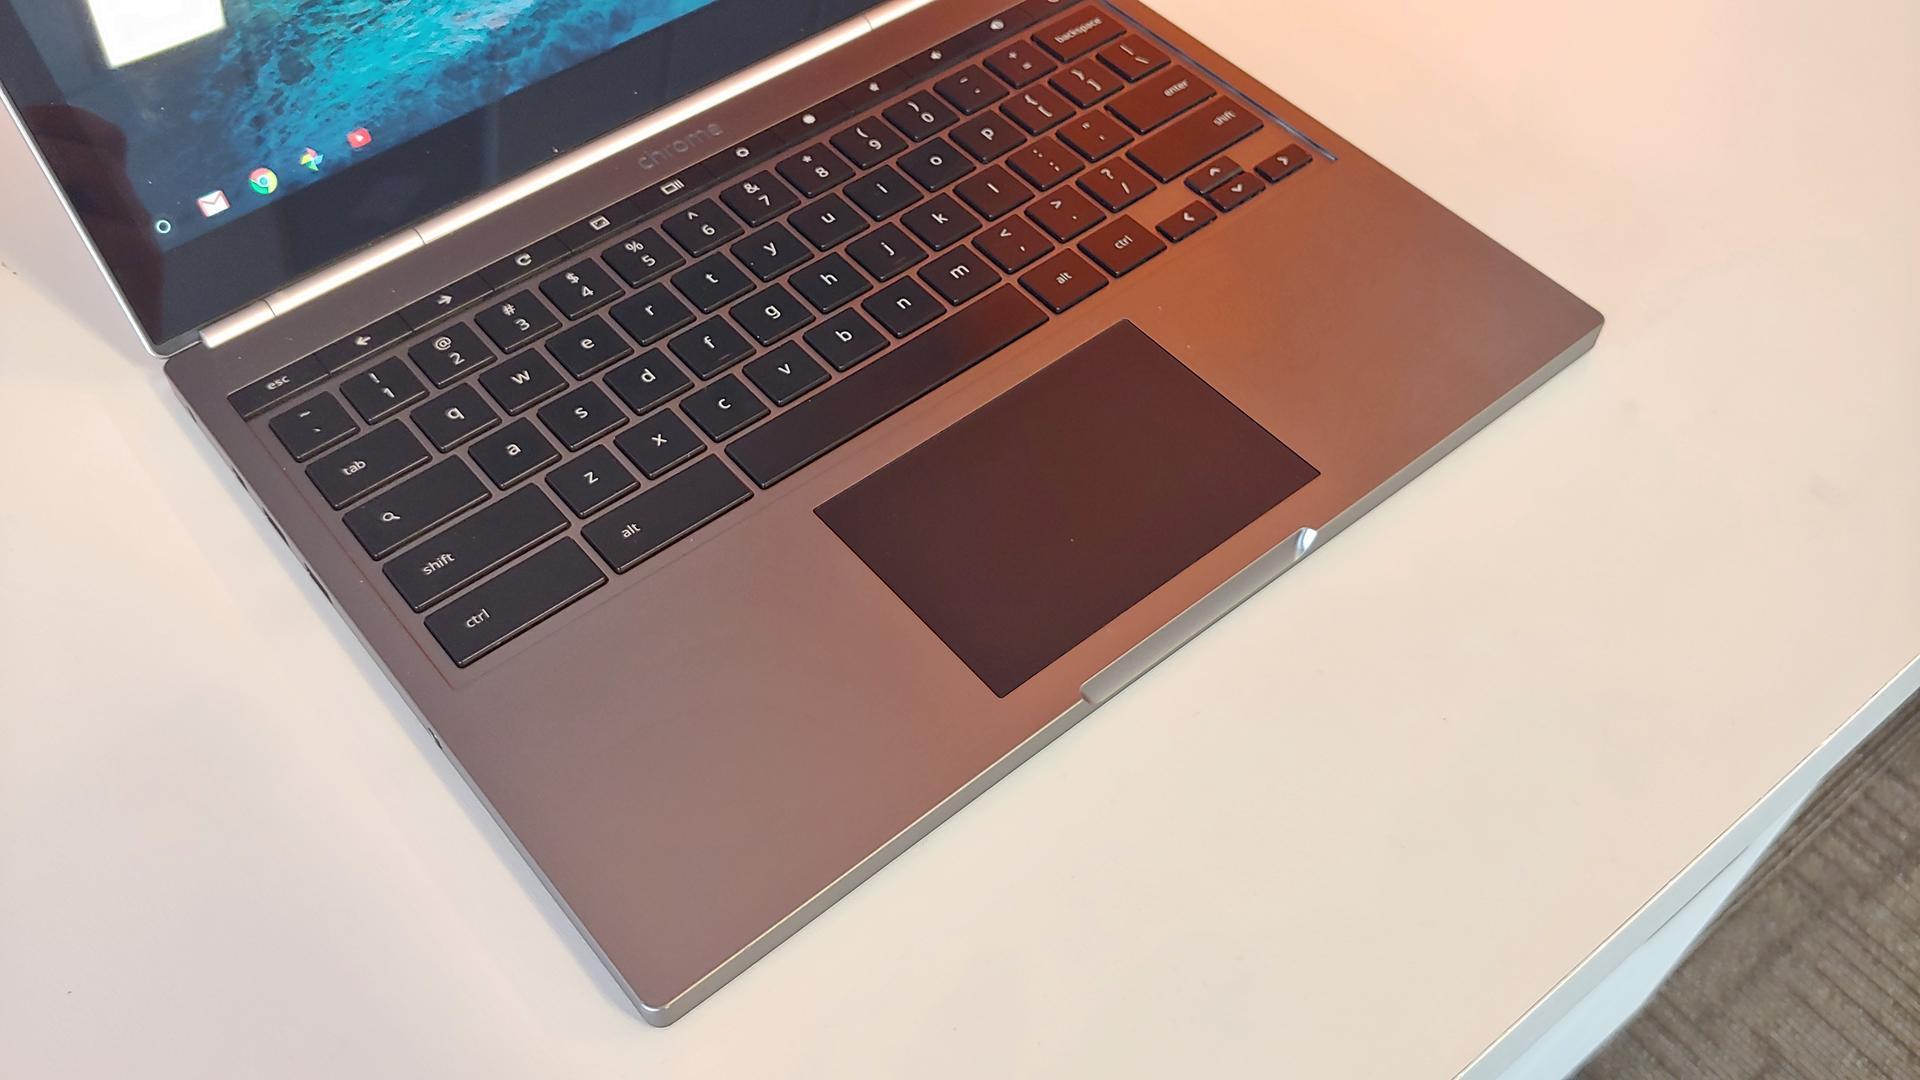 Chromebook Pixel 1st Gen, 2013 - Silver, 32 GB, 4 GB